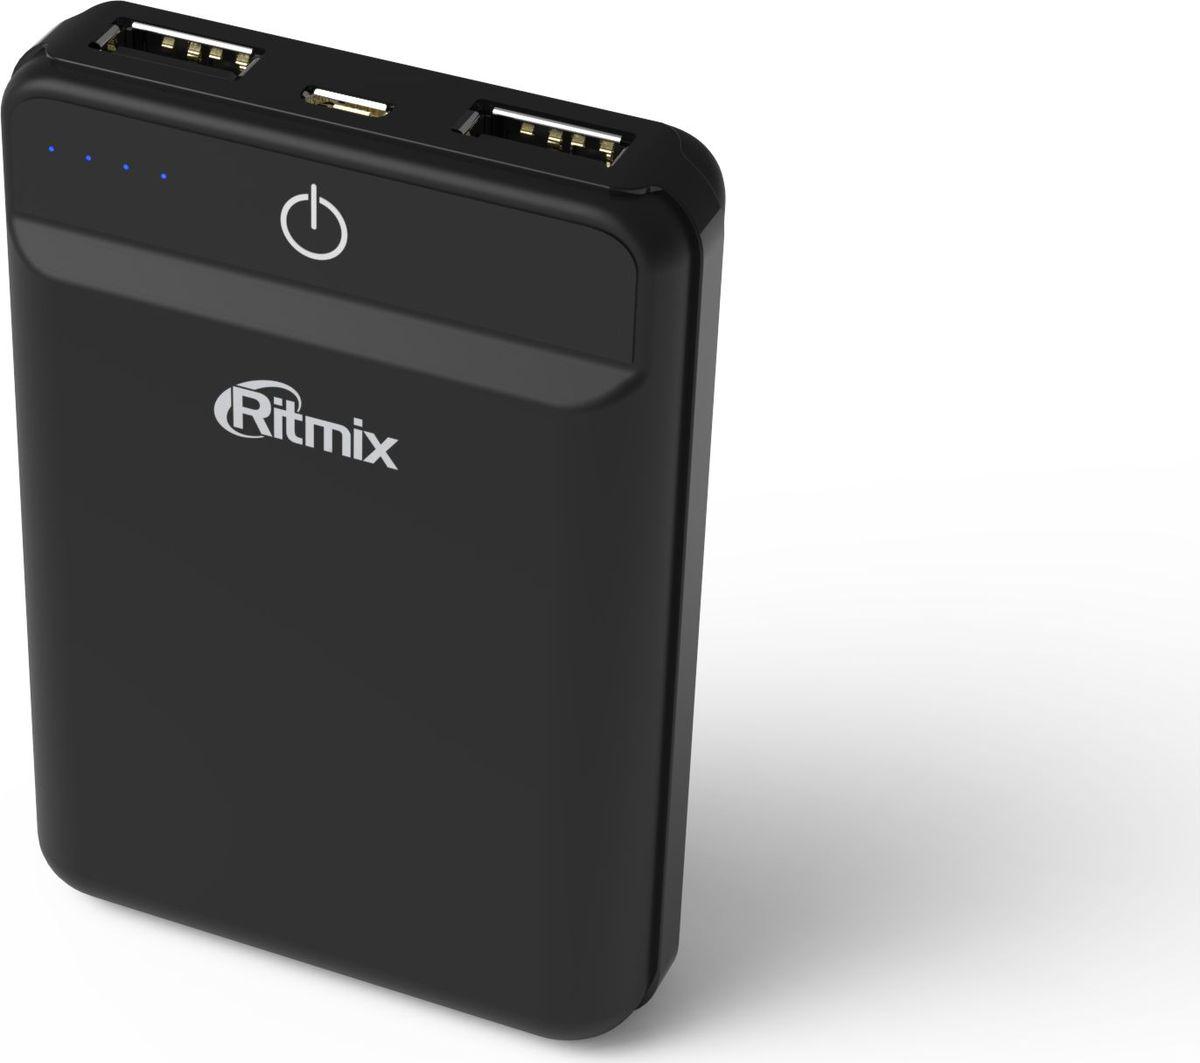 Ritmix RPB-10003L, Black внешний аккумулятор (10000 мАч) mediacon sp30000a universal 5v 30000mah li ion polymer solar power bank charger black